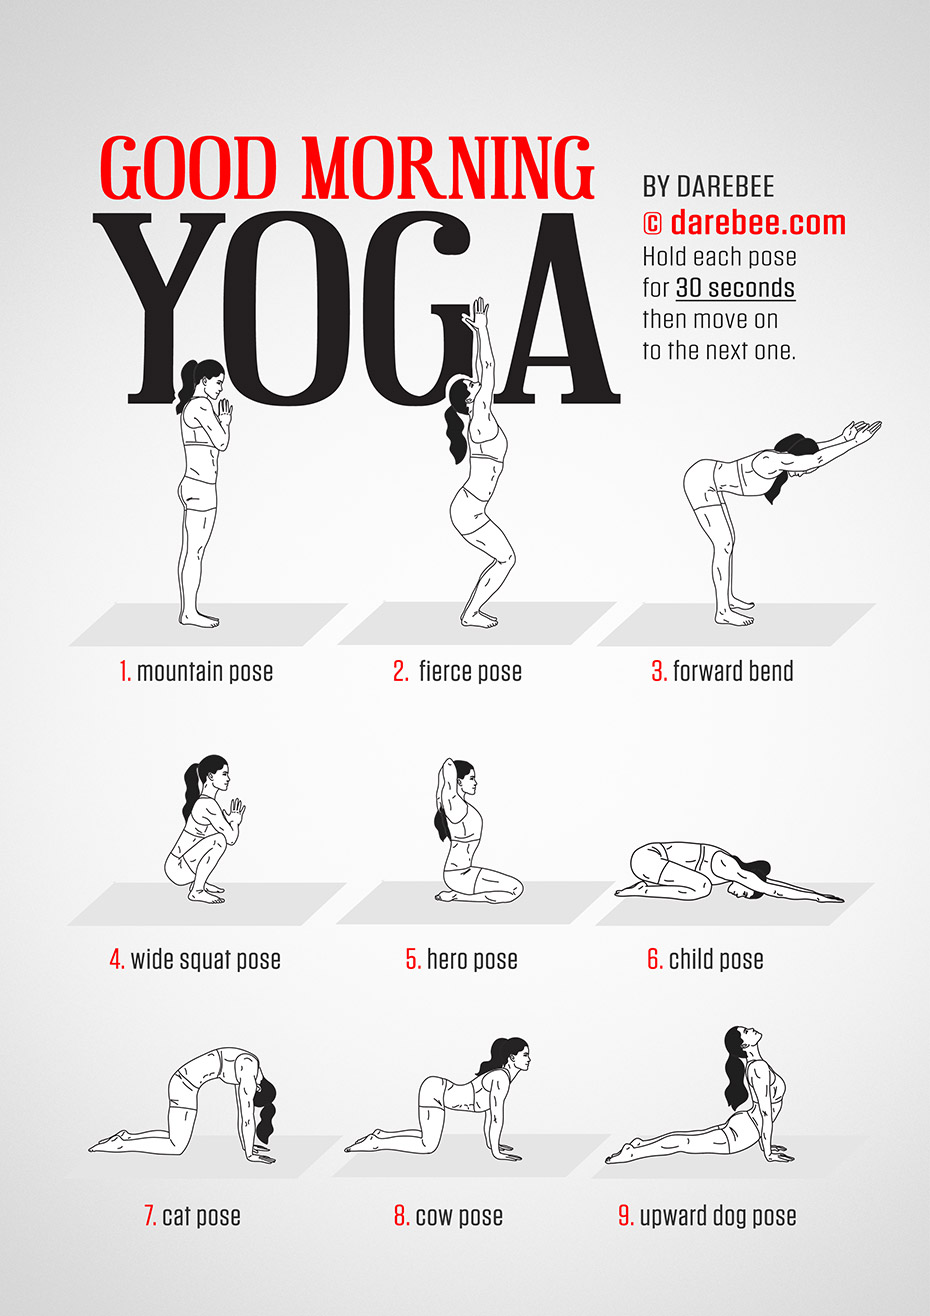 Good Morning Yoga Workout Morning yoga workouts, Yoga